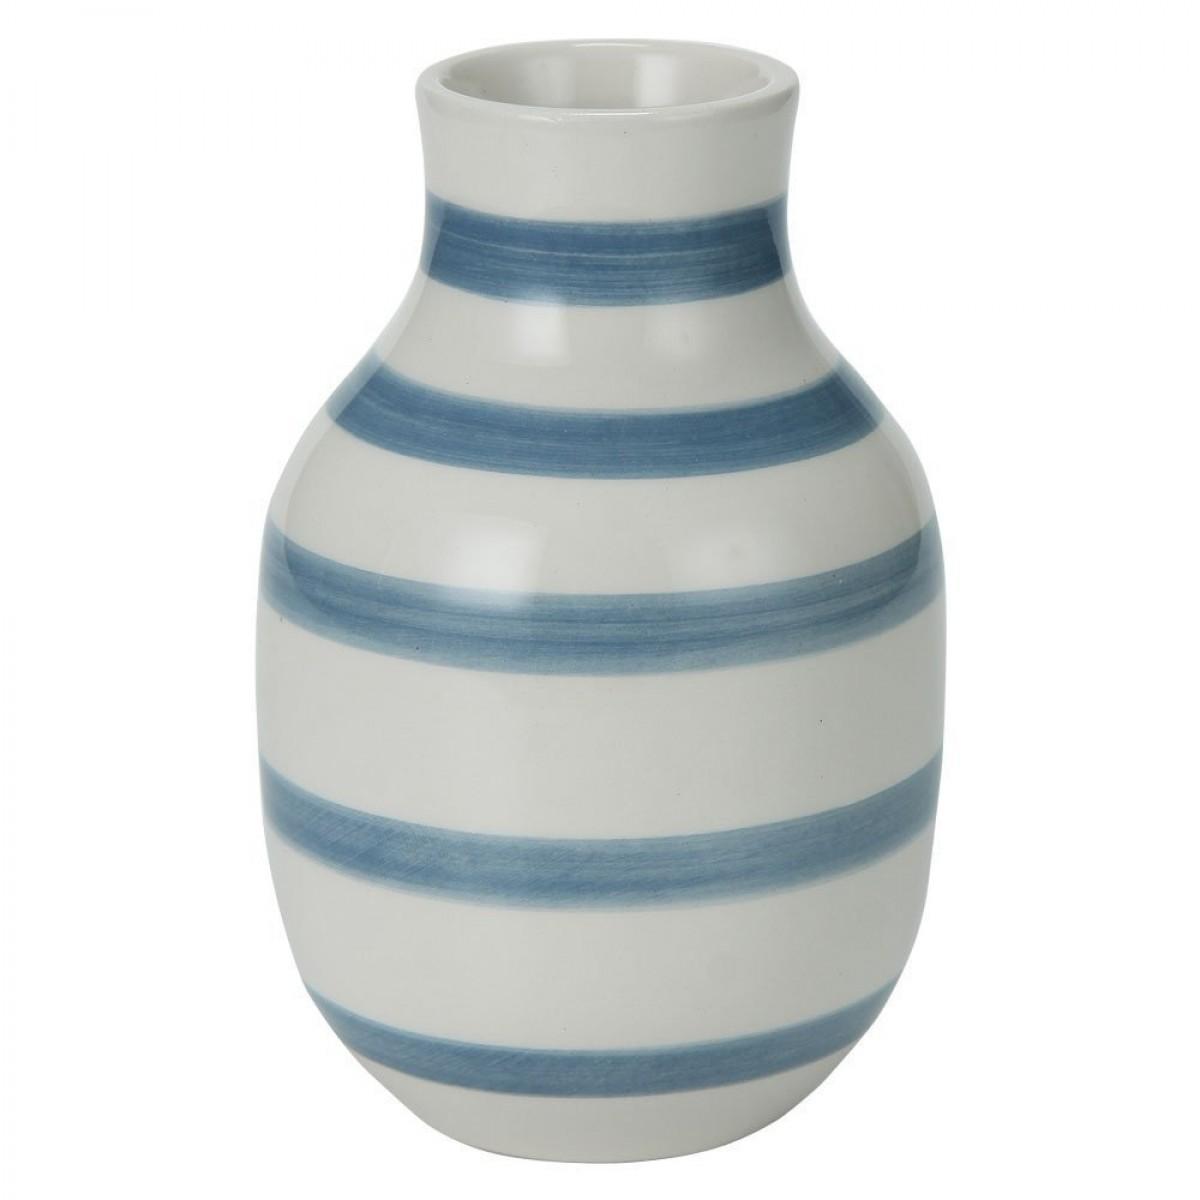 KÄHLER Omaggio vase lys blå 12,5 cm